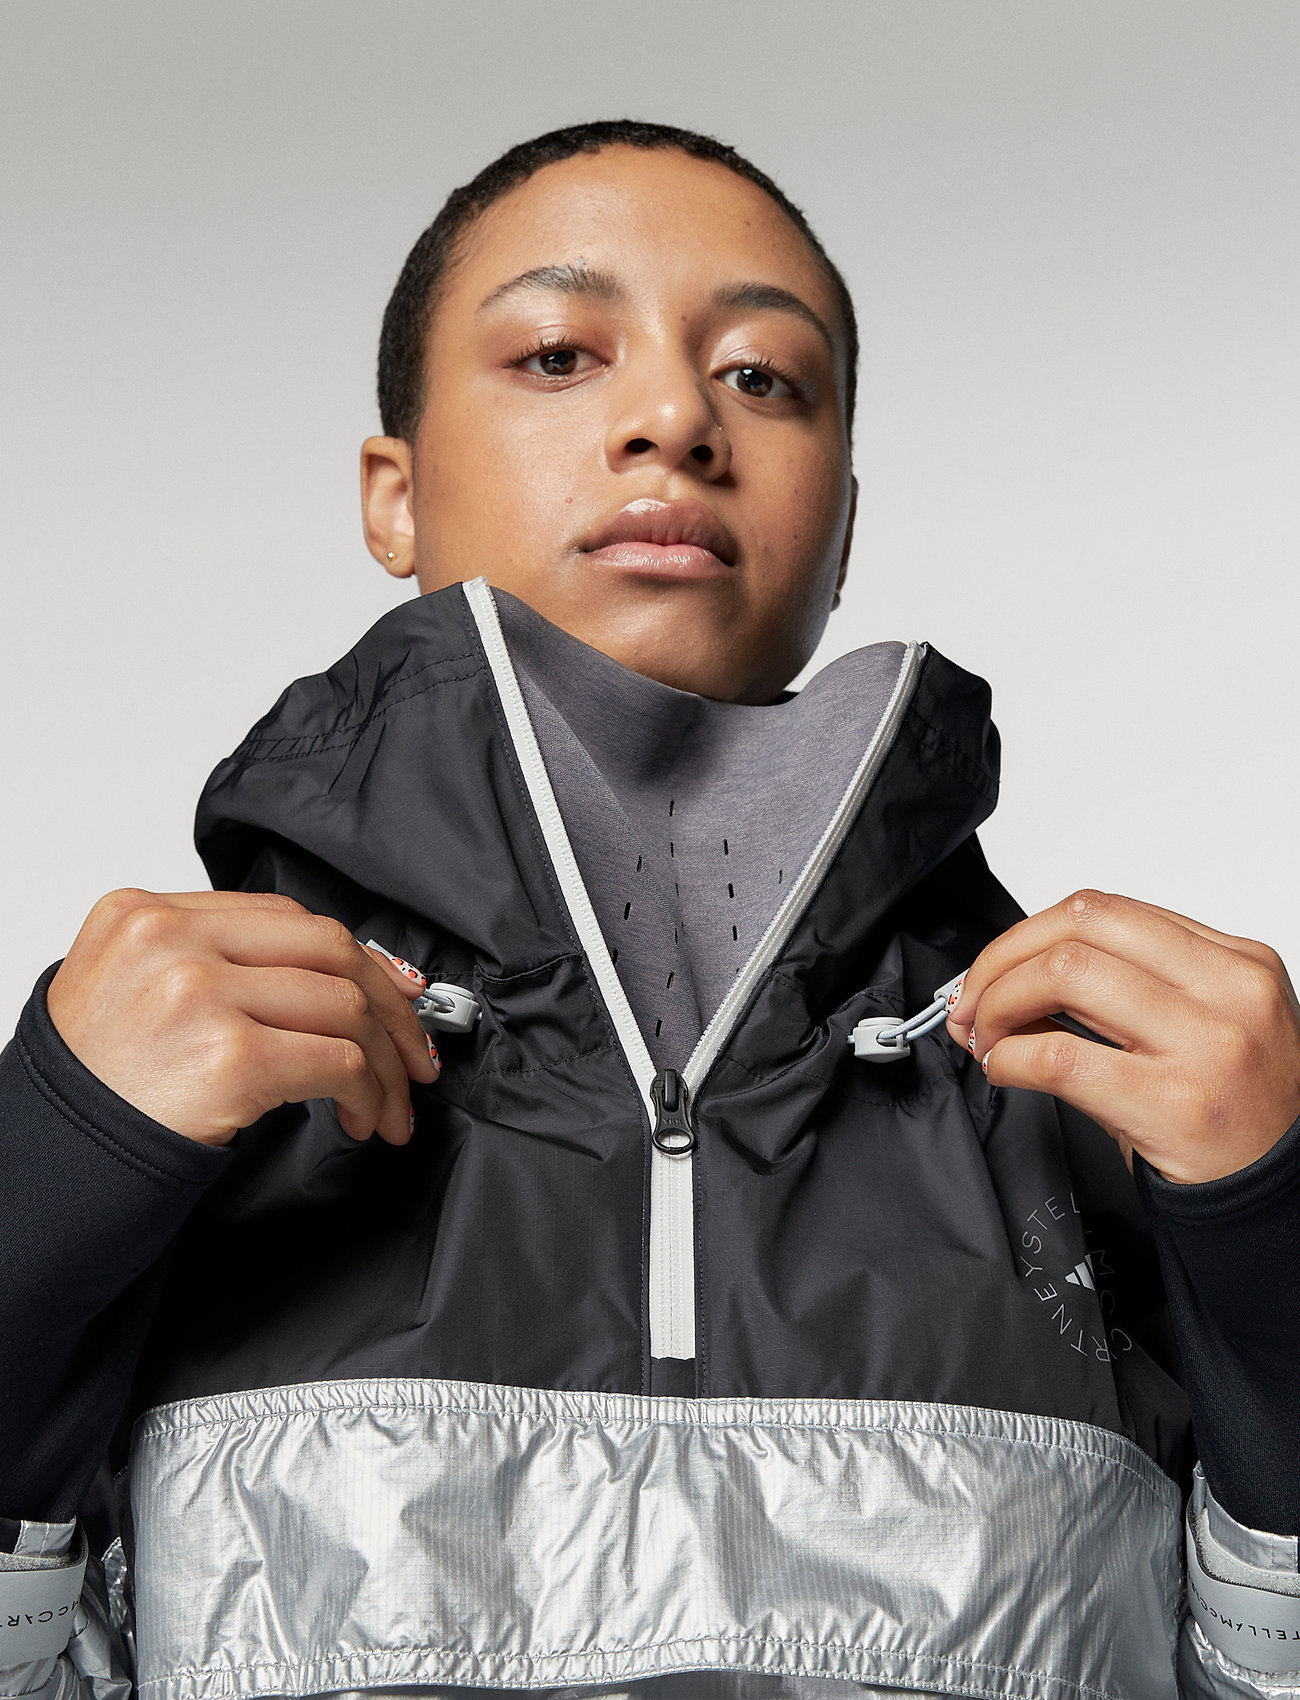 adidas by Stella McCartney - URBXTR PULLON - training jackets - black/metsil - 5